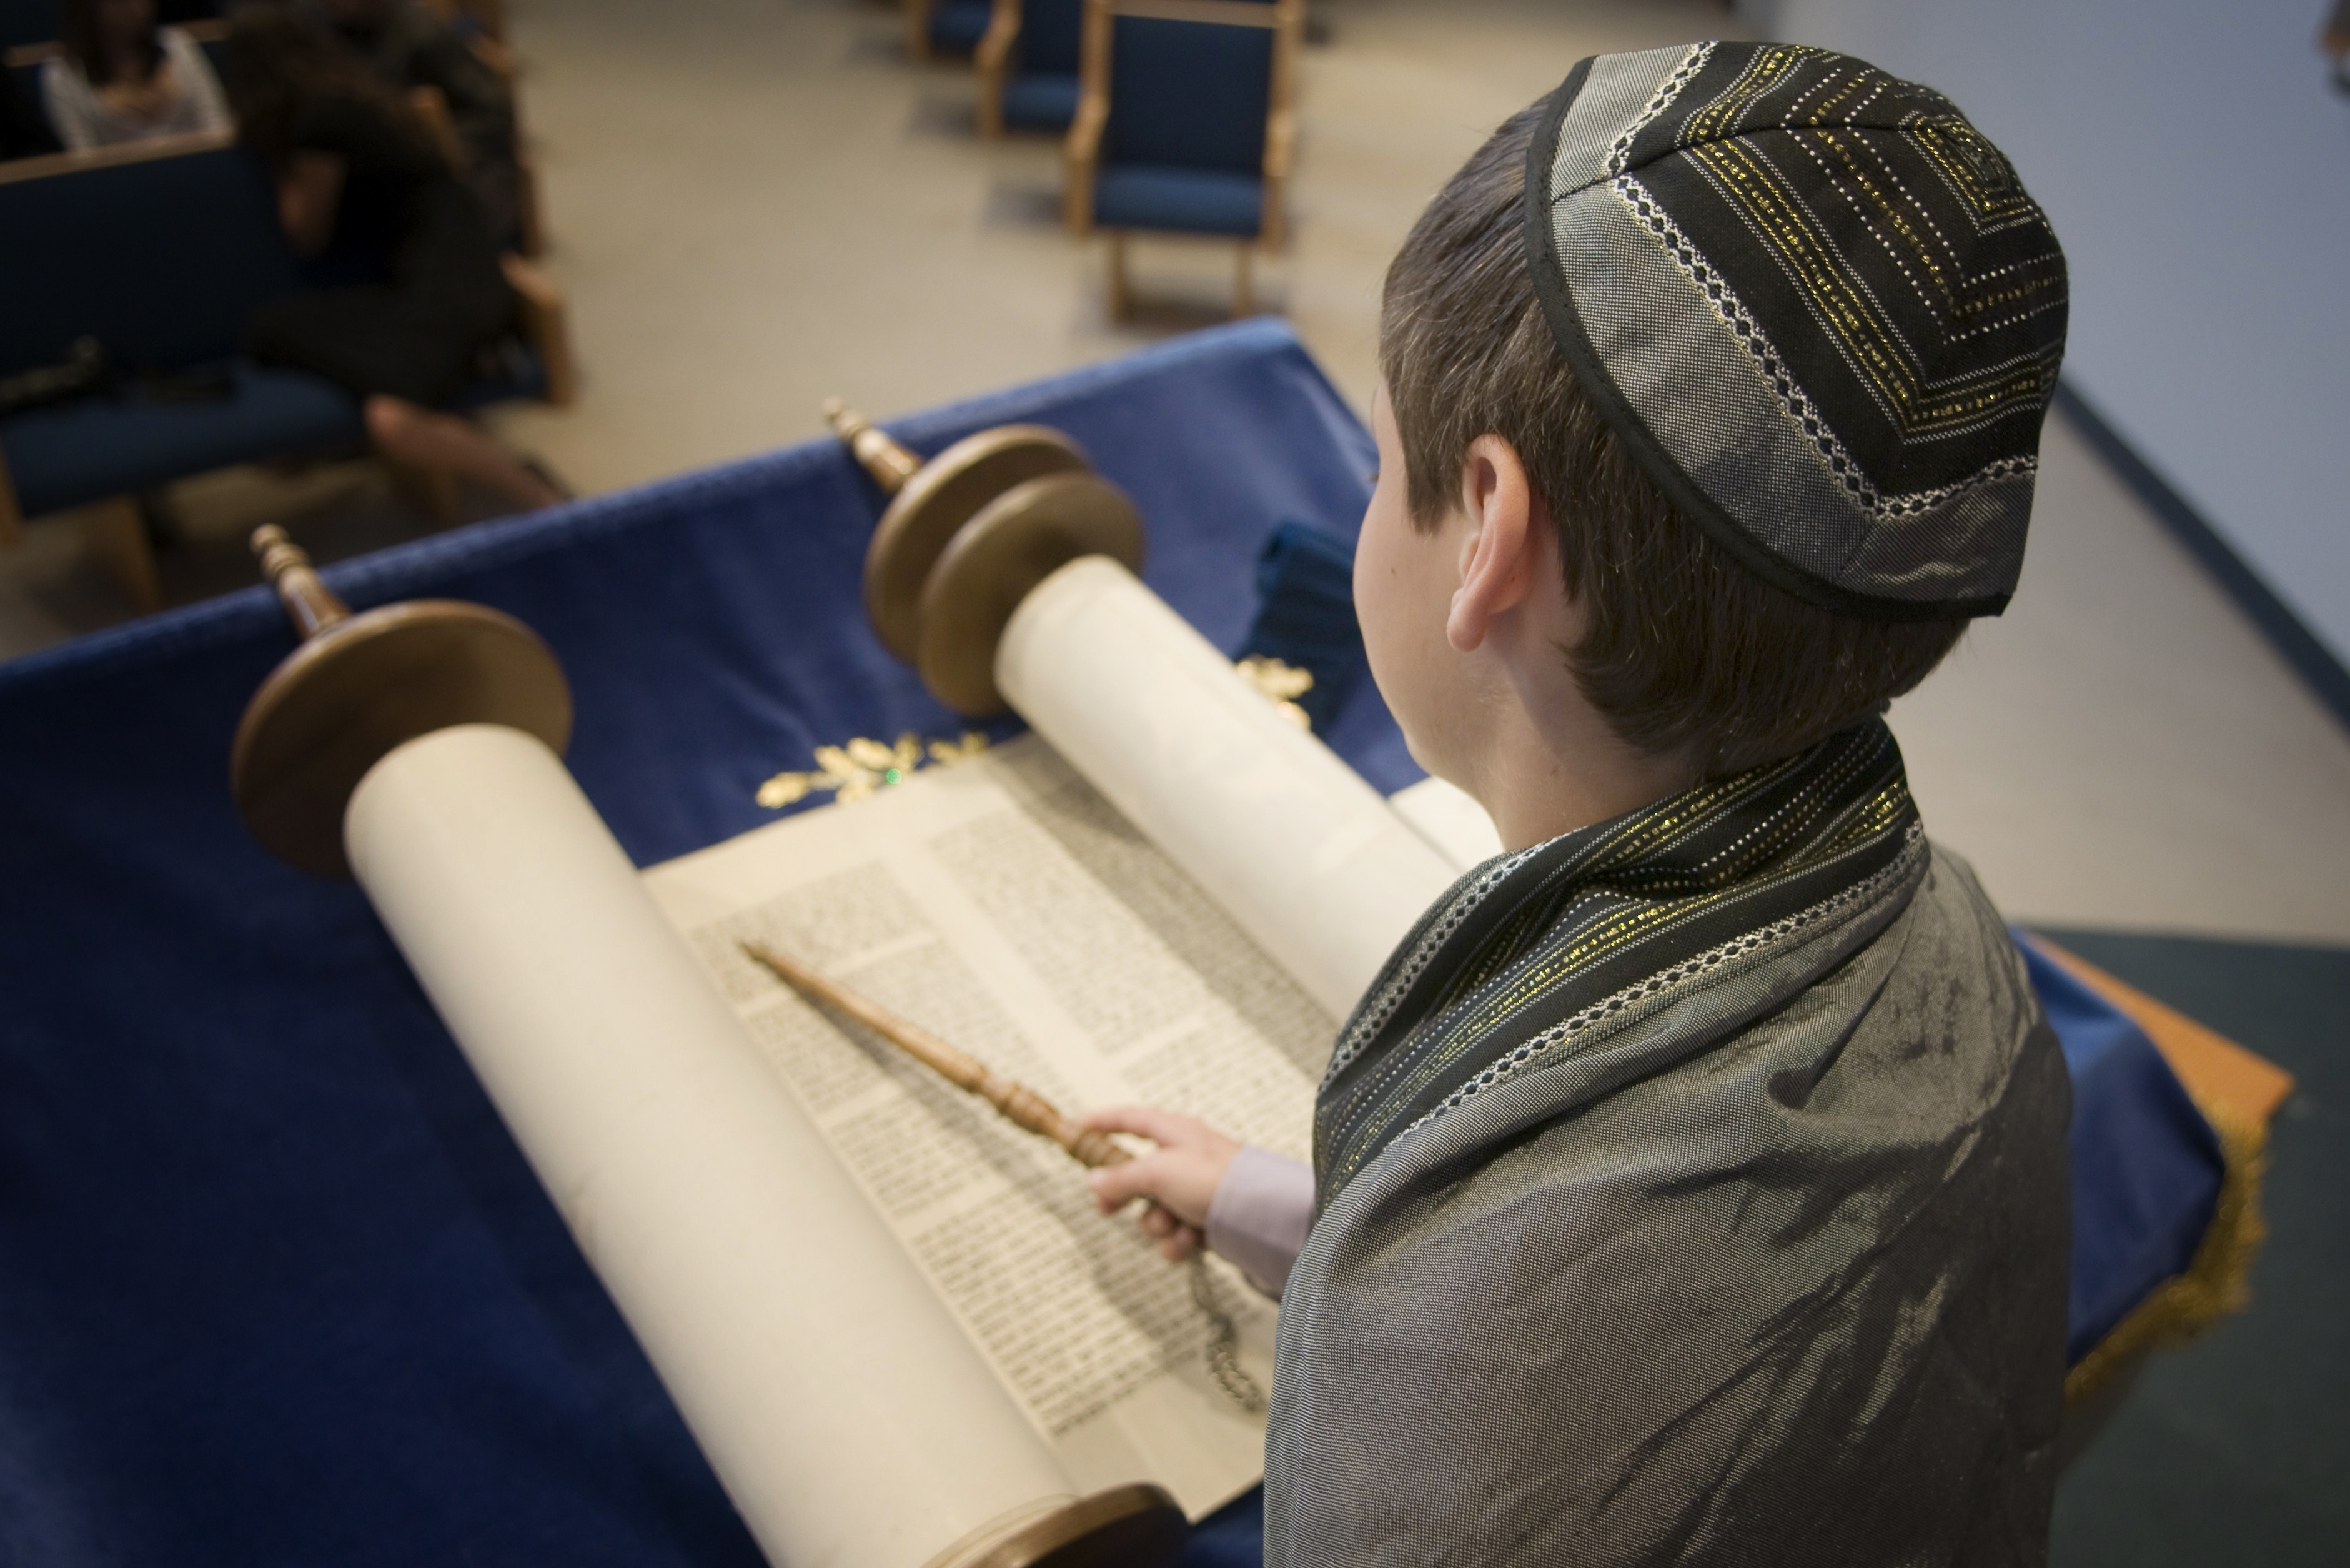 mitzvah minneapolis (4)